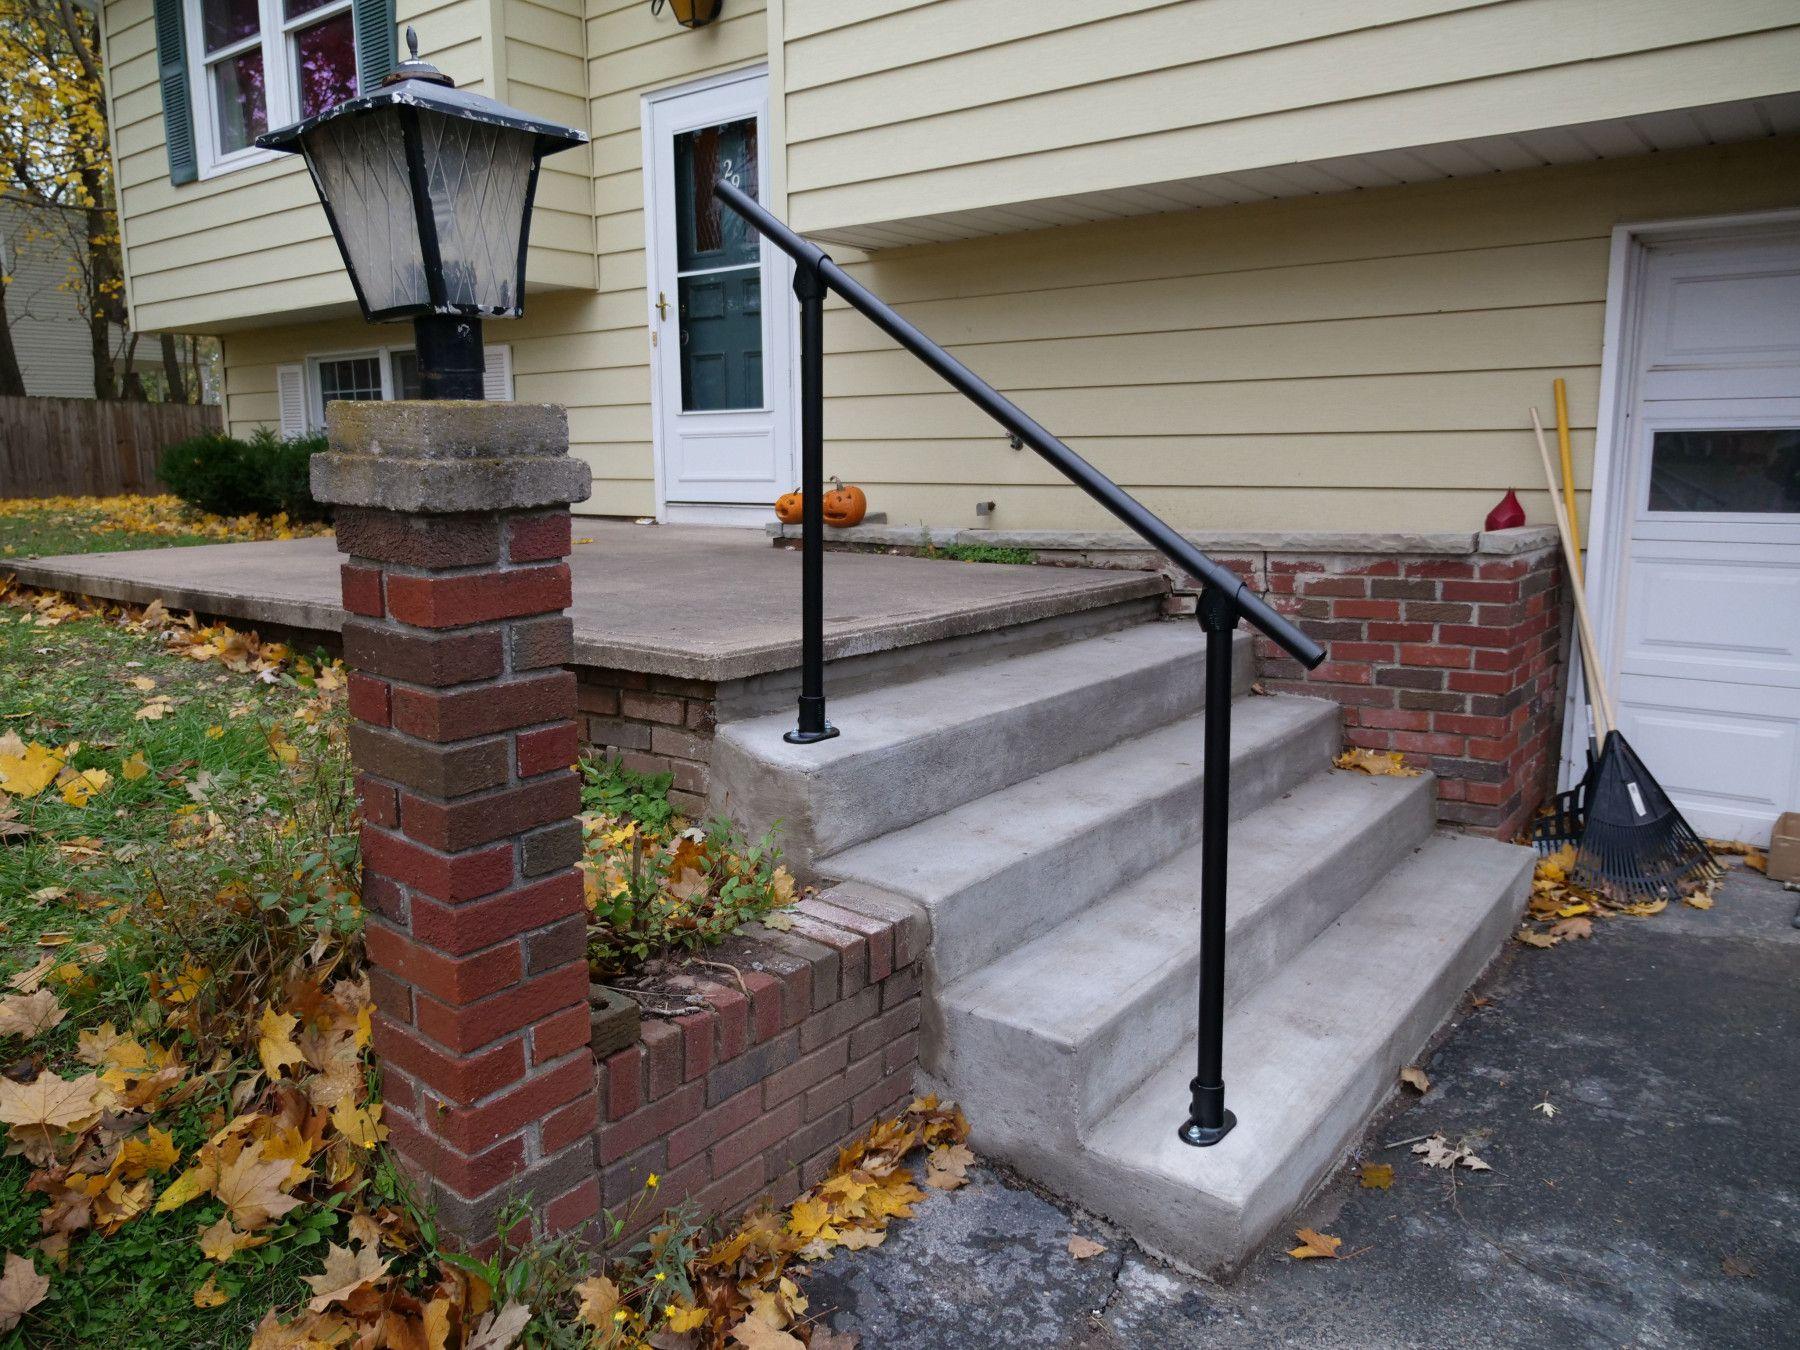 Black Surface 29 Affordable Exterior Handrail Simplified Building Exterior Handrail Outdoor Handrail Handrail